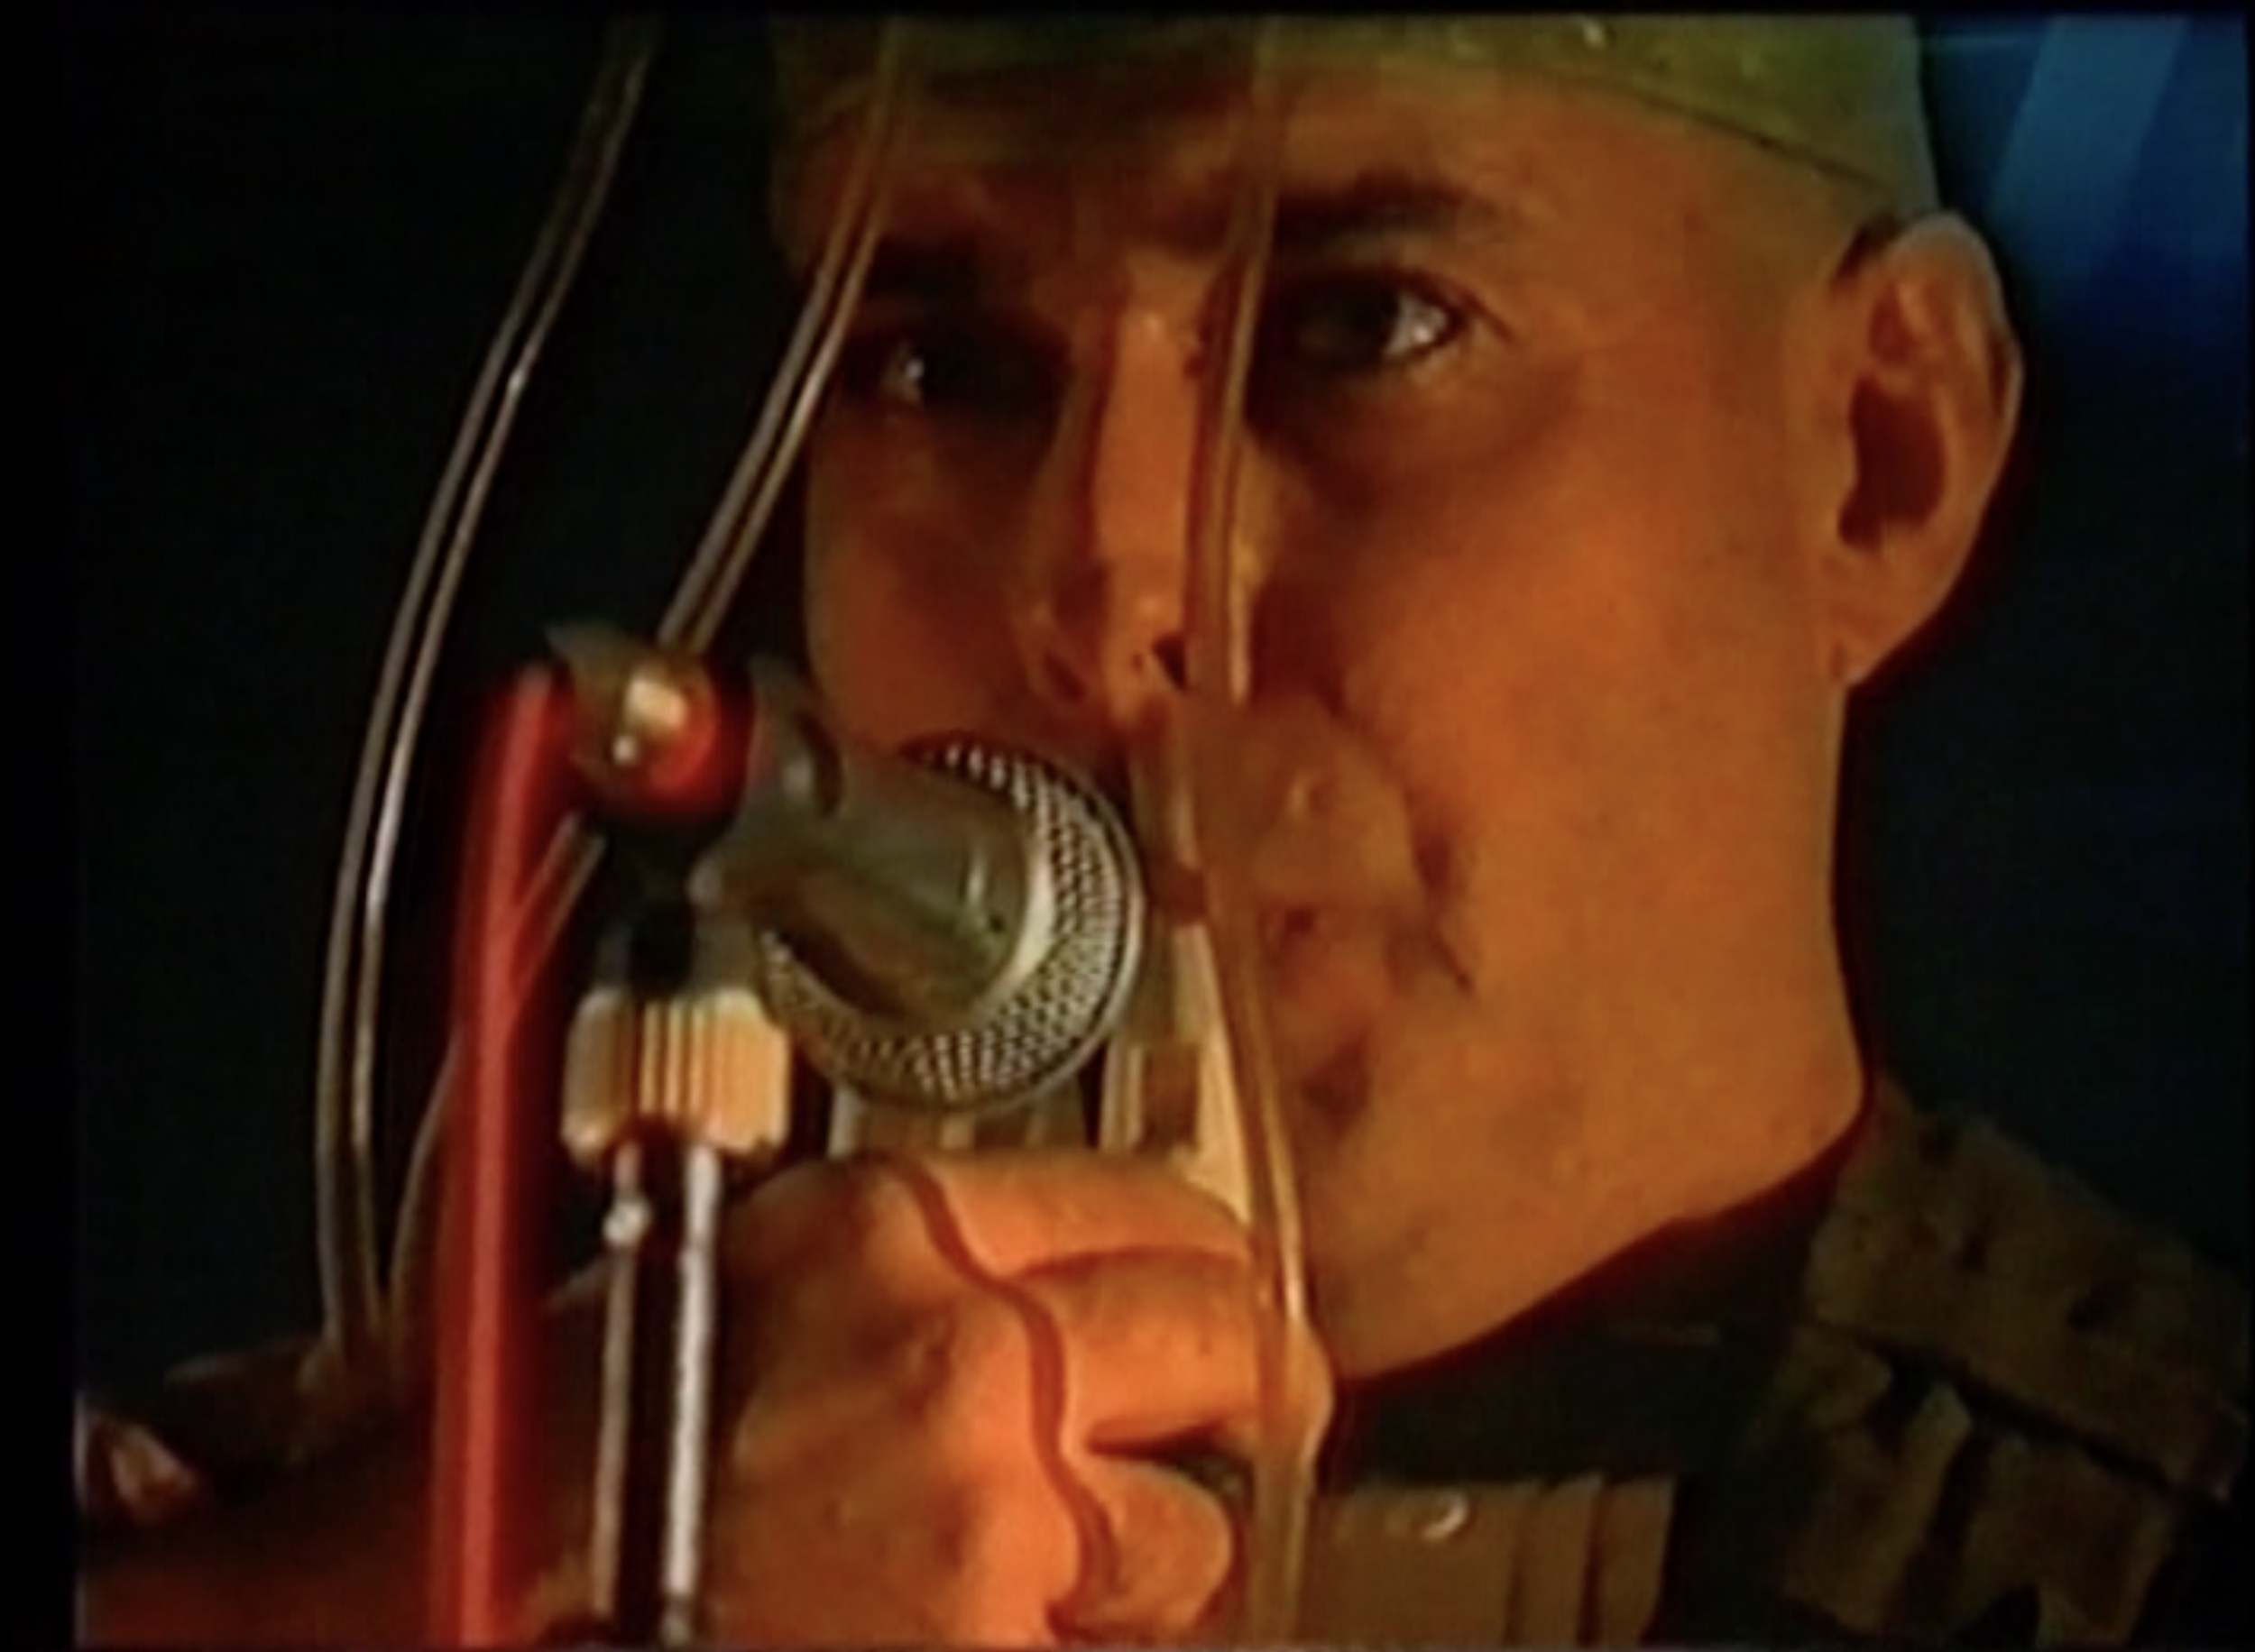 Image from Panta Rai, Performance Video with Yossi Lederman, 1991